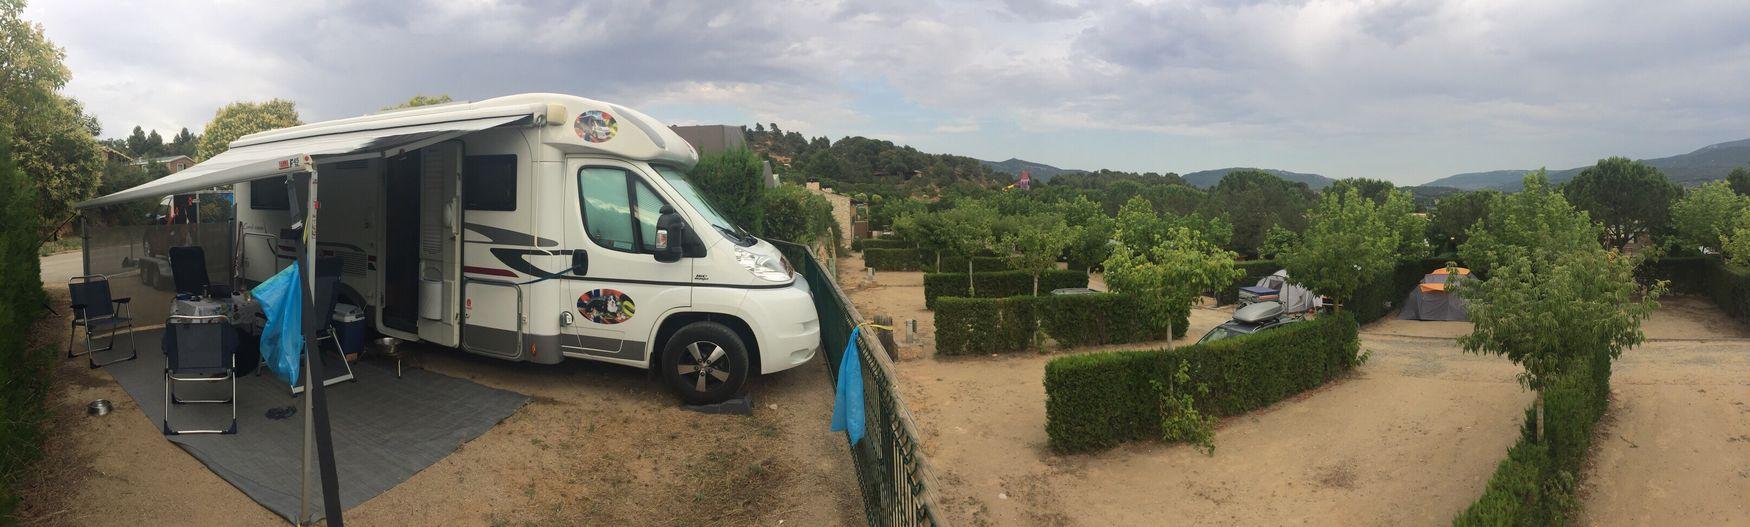 Camping Motorhome Autocaravana Bobil in Montblanc